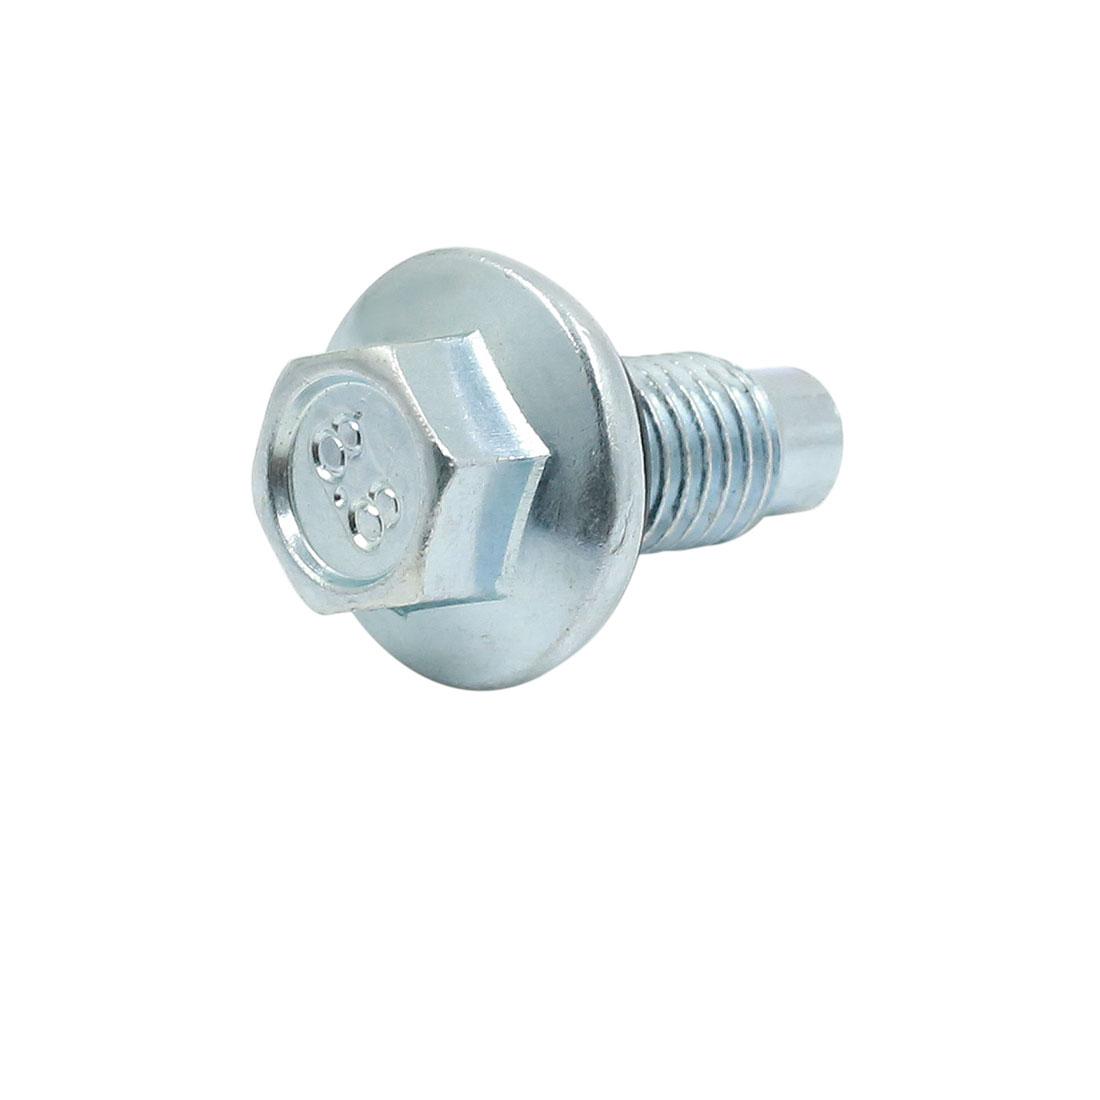 26 x 37mm Silver Tone Magnetic Engine Oil Pan Drain Plug Bolt for Auto Car